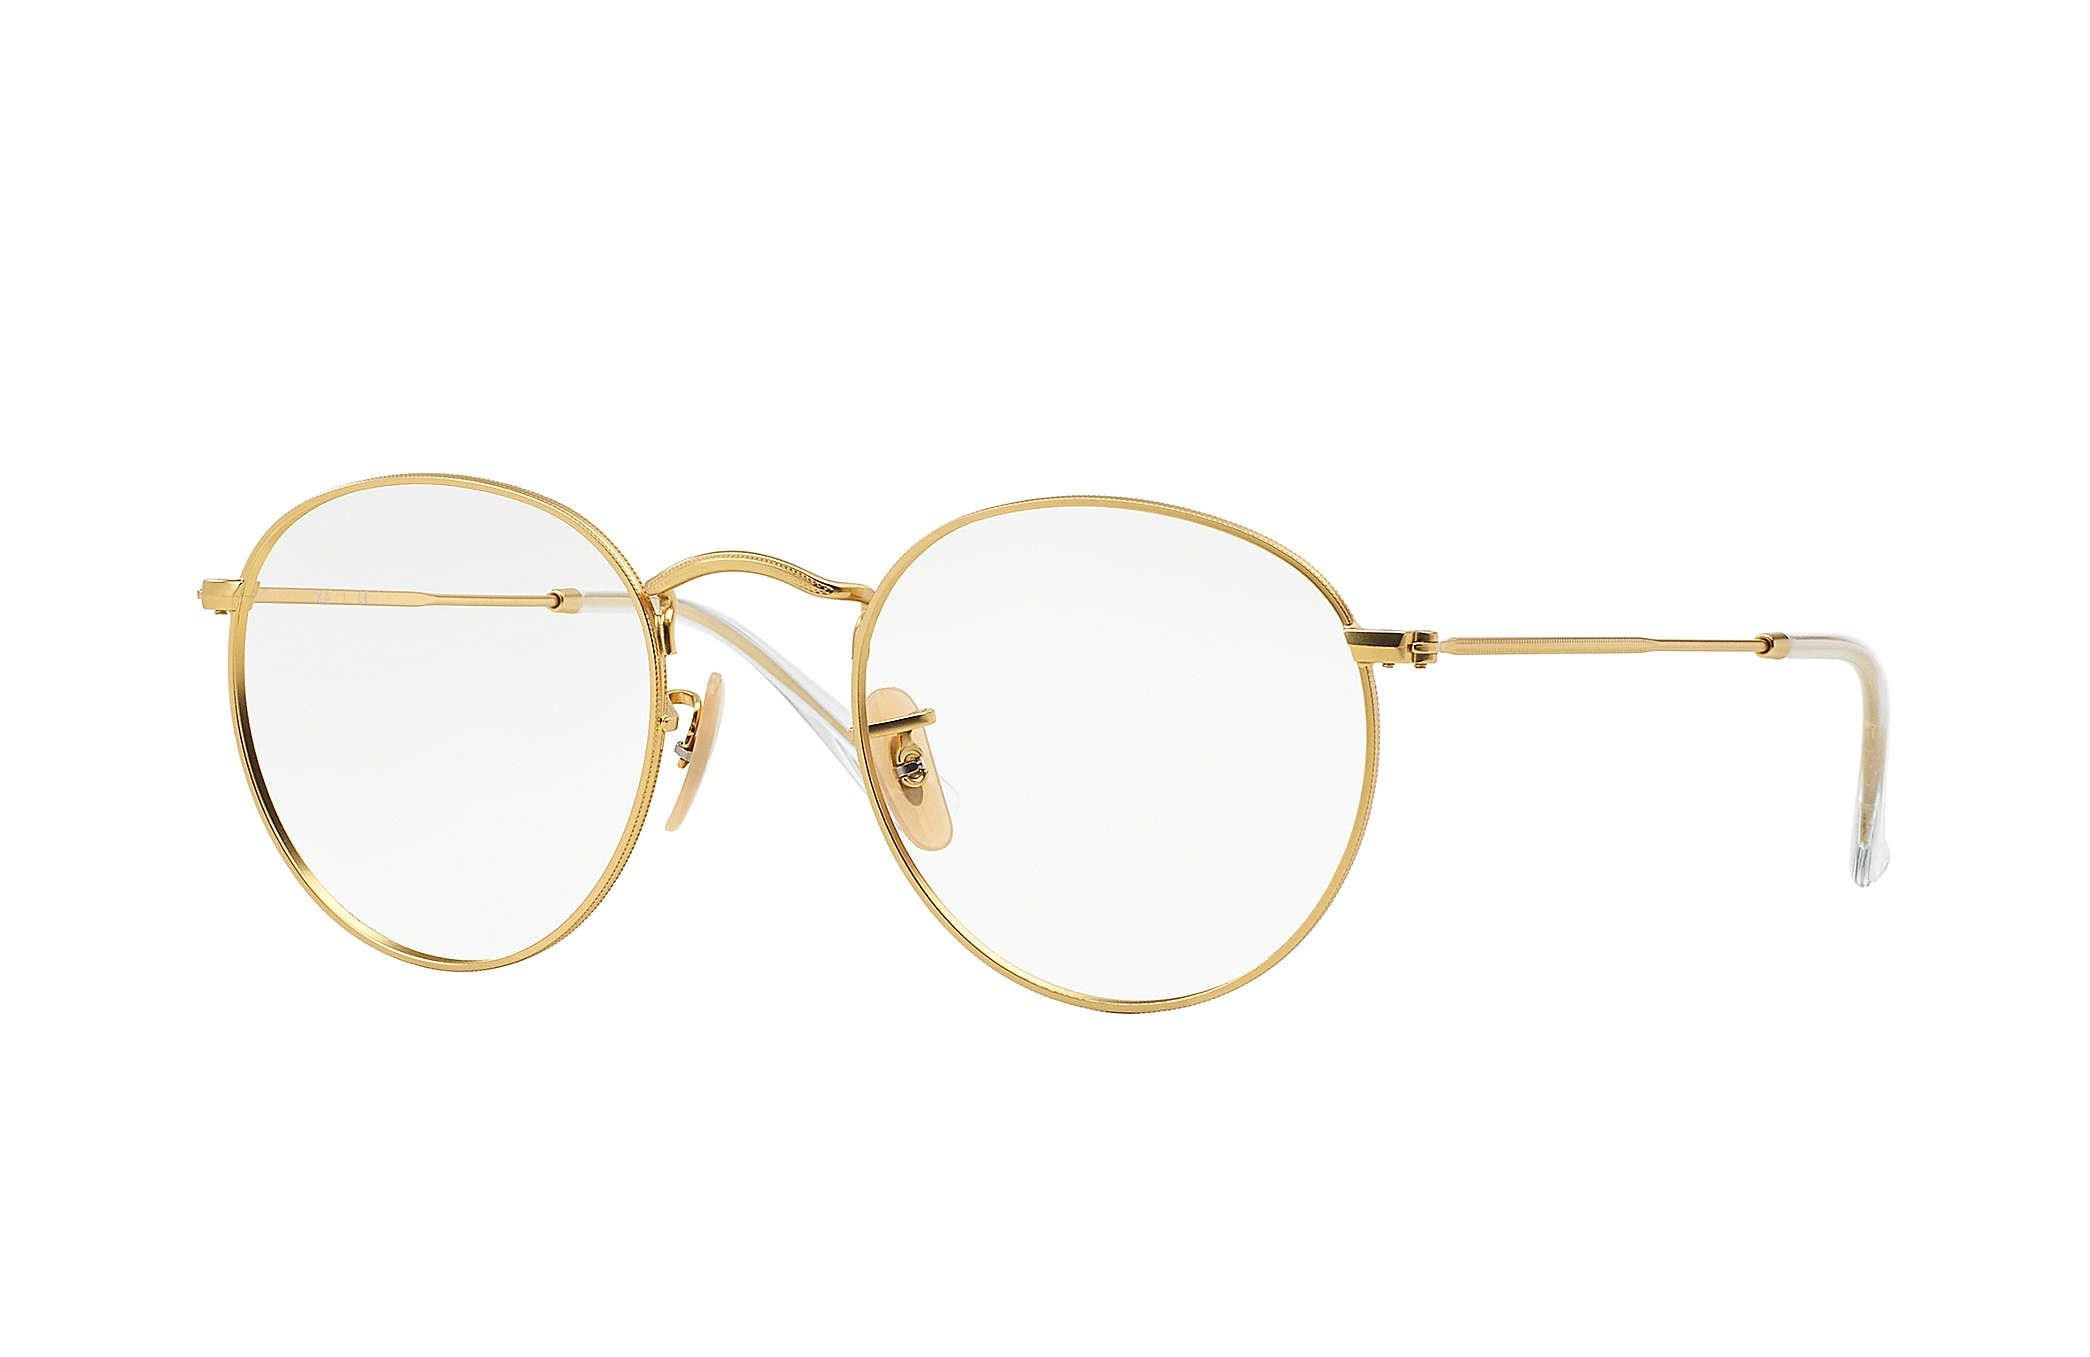 8a58f40f9 Ray-Ban 0RX3447V-RB3447V Gold OPTICAL | Wardrobe Wishes | Emily ...